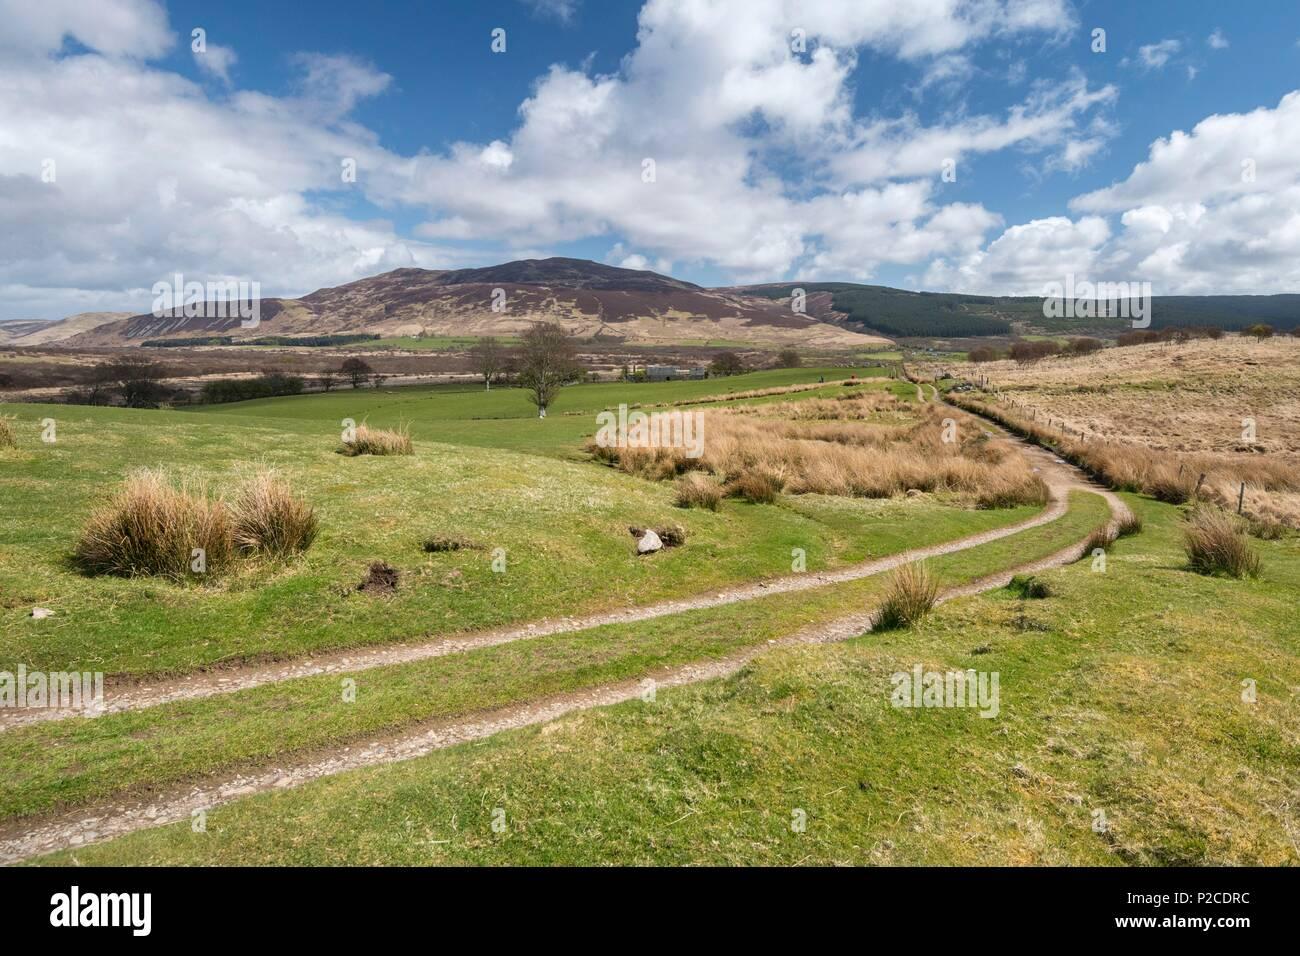 United Kingdom, Scotland, North Ayrshire, Arran island, Blackwaterfoot, typical landscape - Stock Image